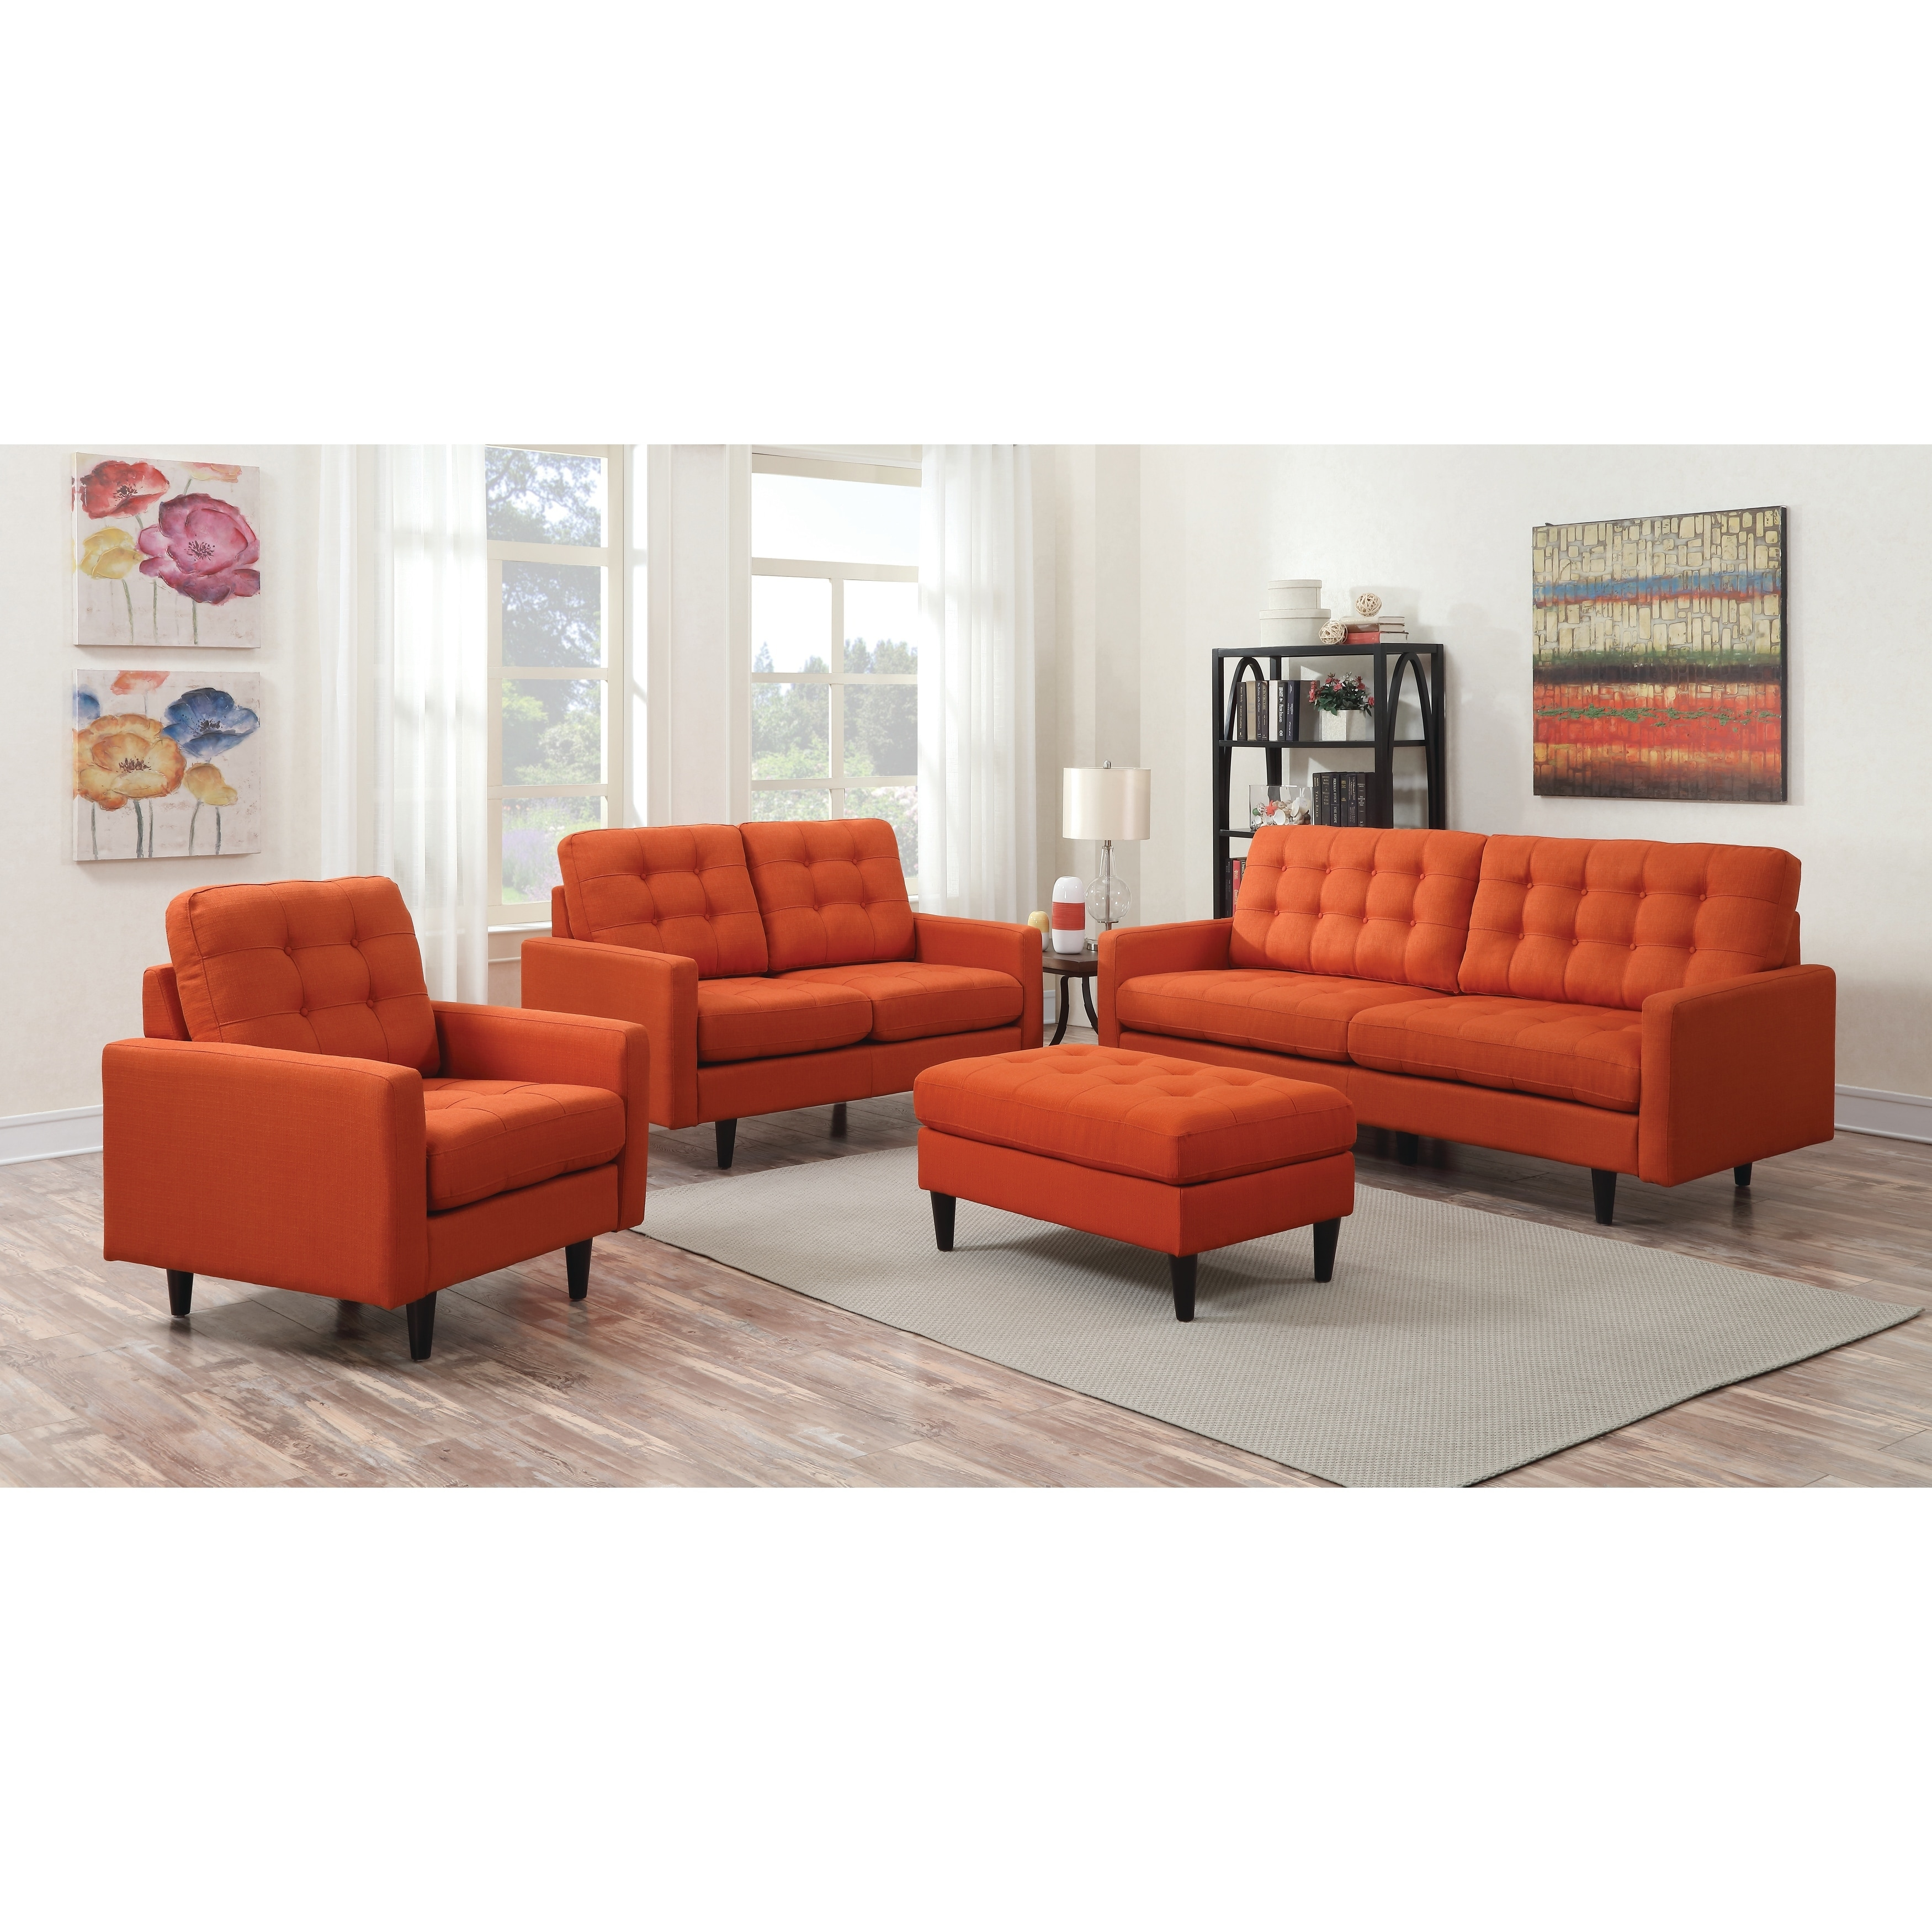 Shop Kesson Mid Century Modern Sofa Free Shipping Today